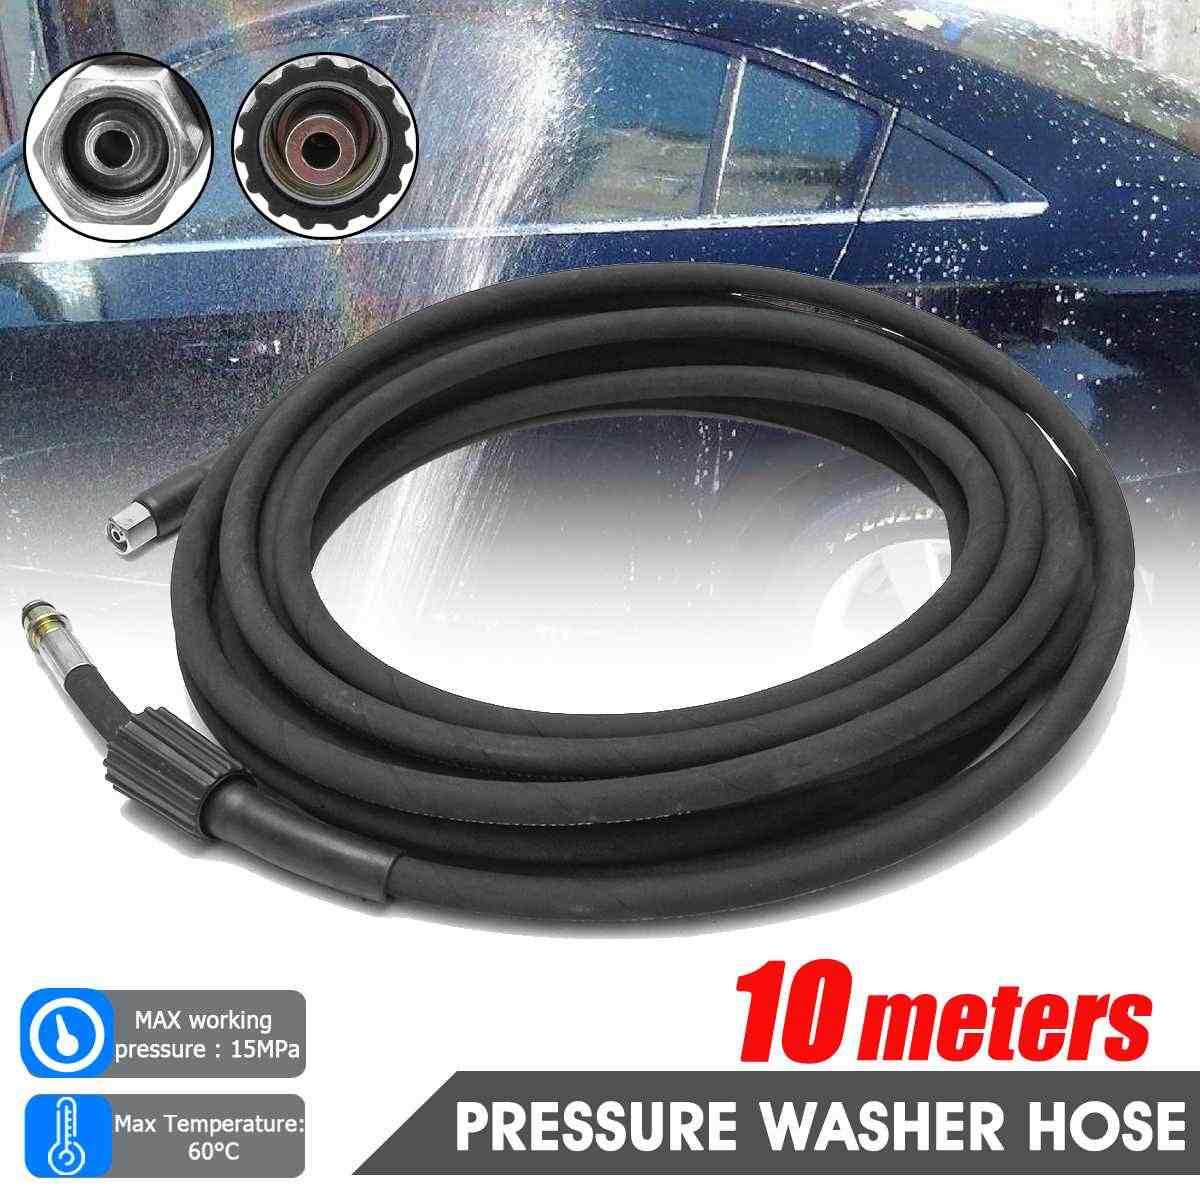 Audew Zwart 10 Meter Universele Hogedrukreiniger Slang Jet Car Home Power Wassen Wasmachine Extension Slang Cord Water Reinigen Slang